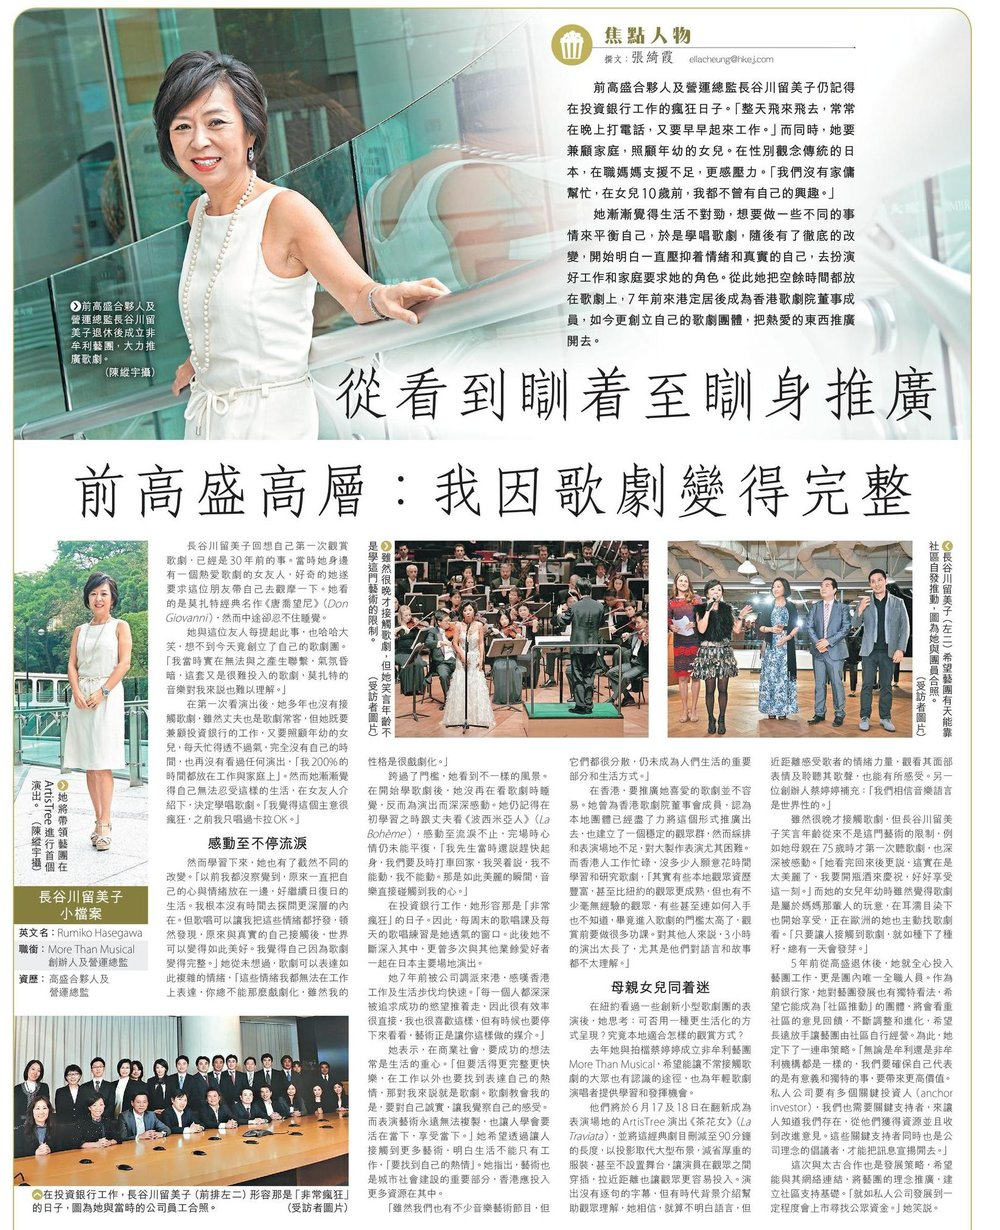 ArtisTree_7 June 2017_HKEJ_C04.jpg